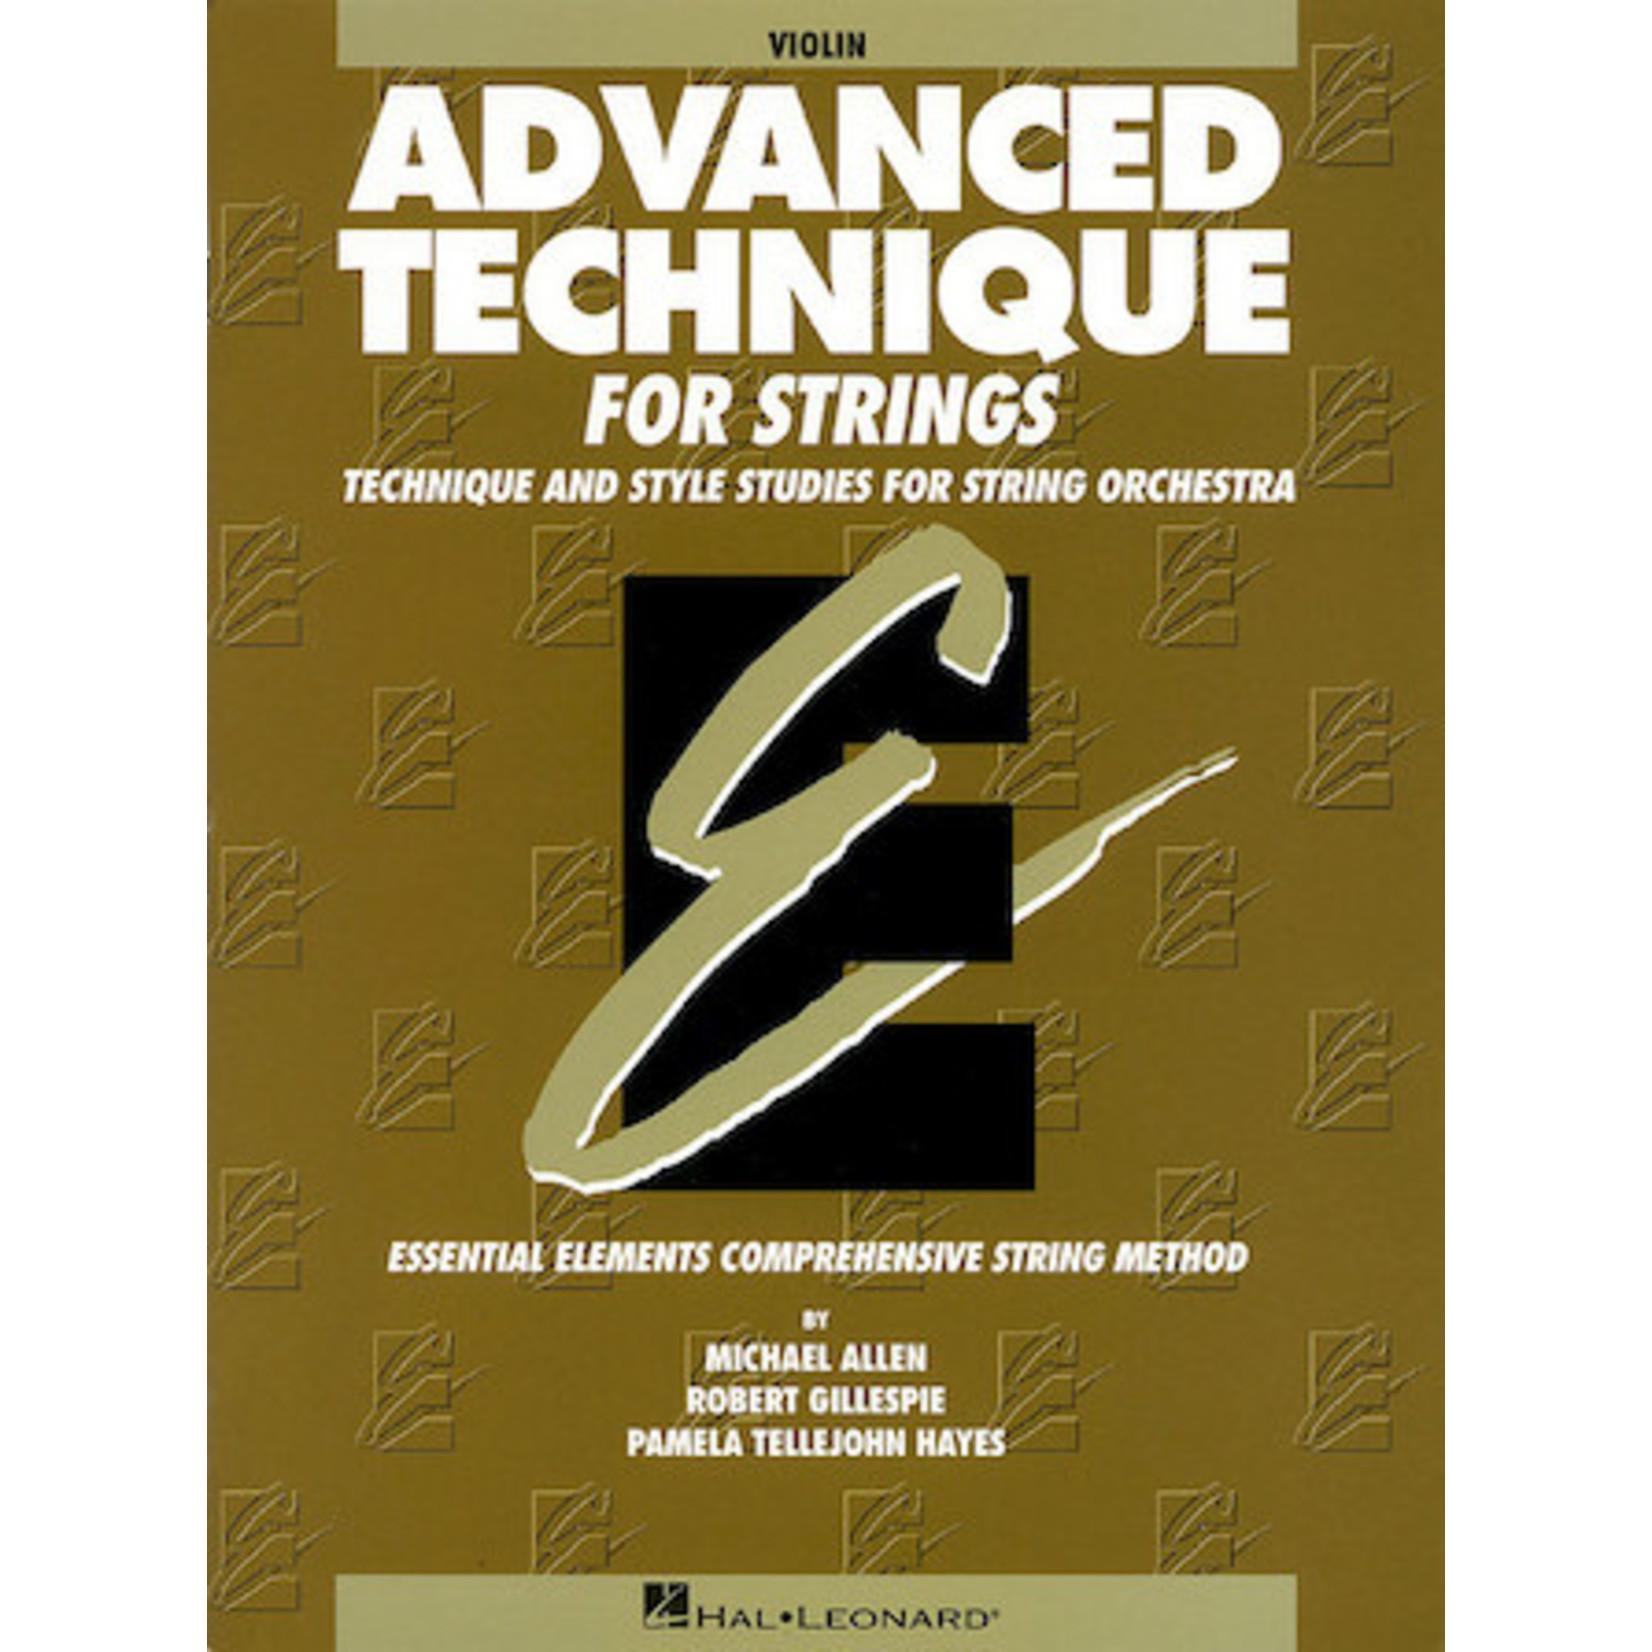 Hal Leonard Advanced Technique for Strings - Violin (Original Series)